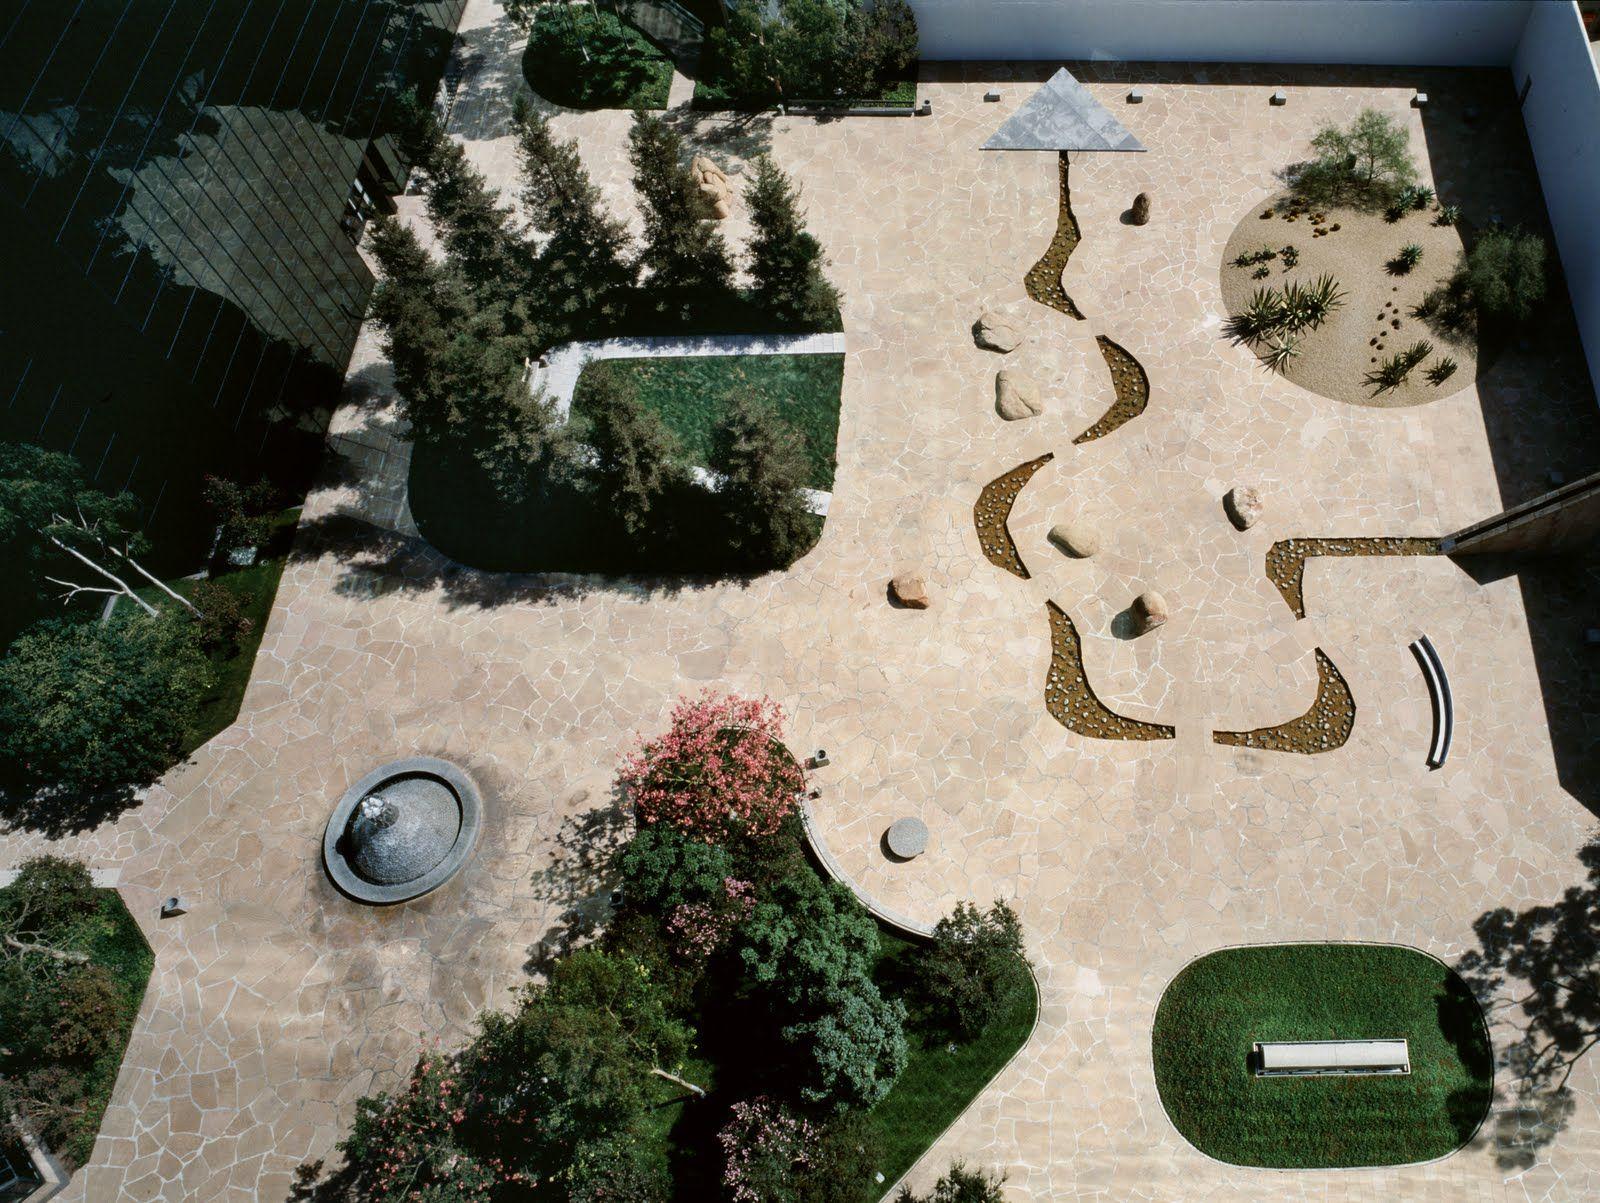 Landscape architect ,artist : Isamu Noguchi ,Sculpture Garden ... for Isamu Noguchi Sculpture Garden  67qdu